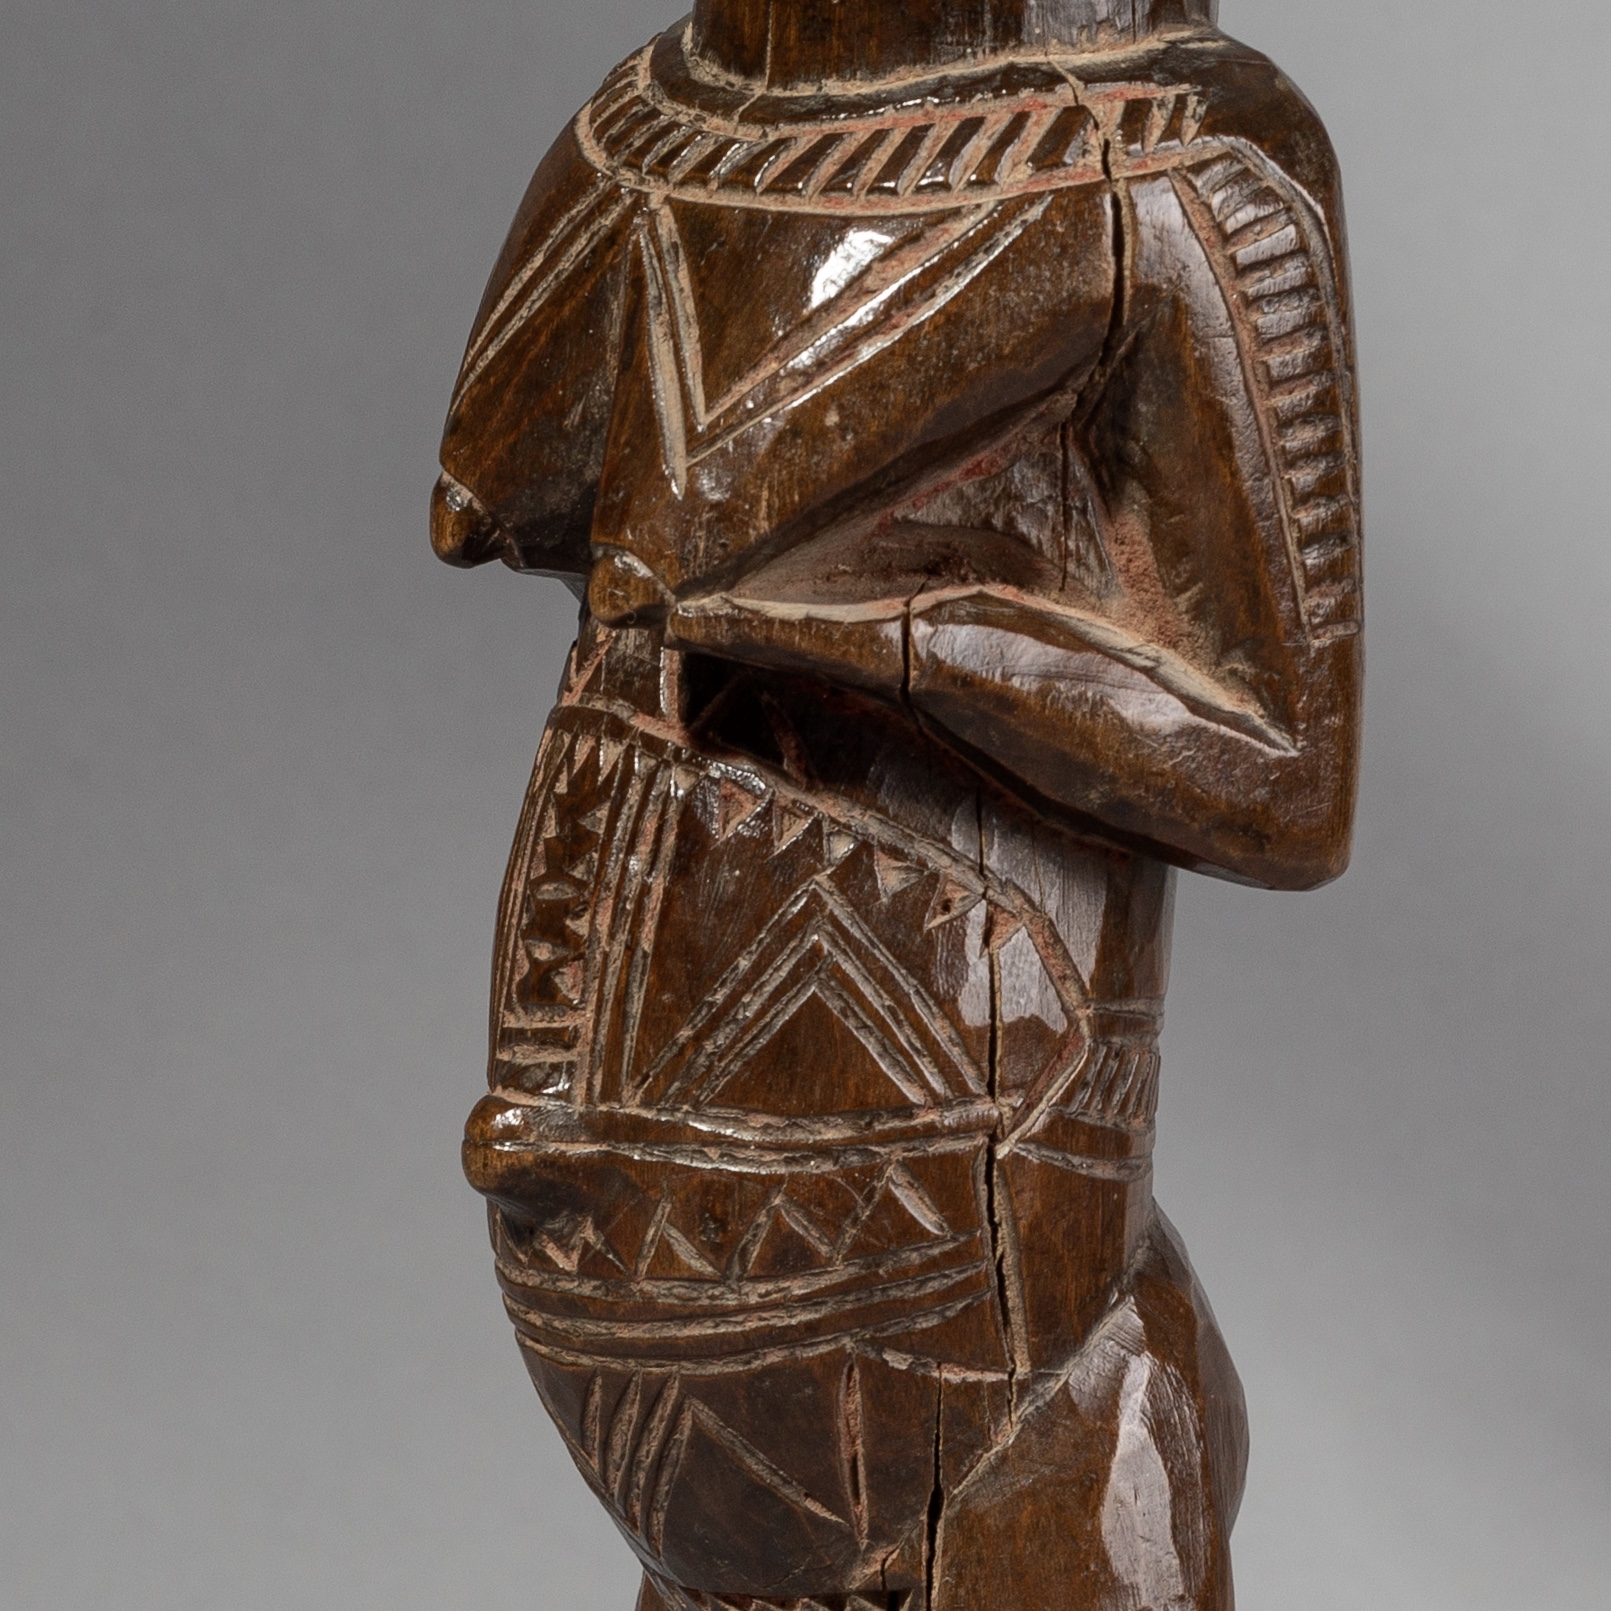 SD A FINELY CARVED IBEJI FROM YORUBA TRIBE NIGERIA( No 1509 )